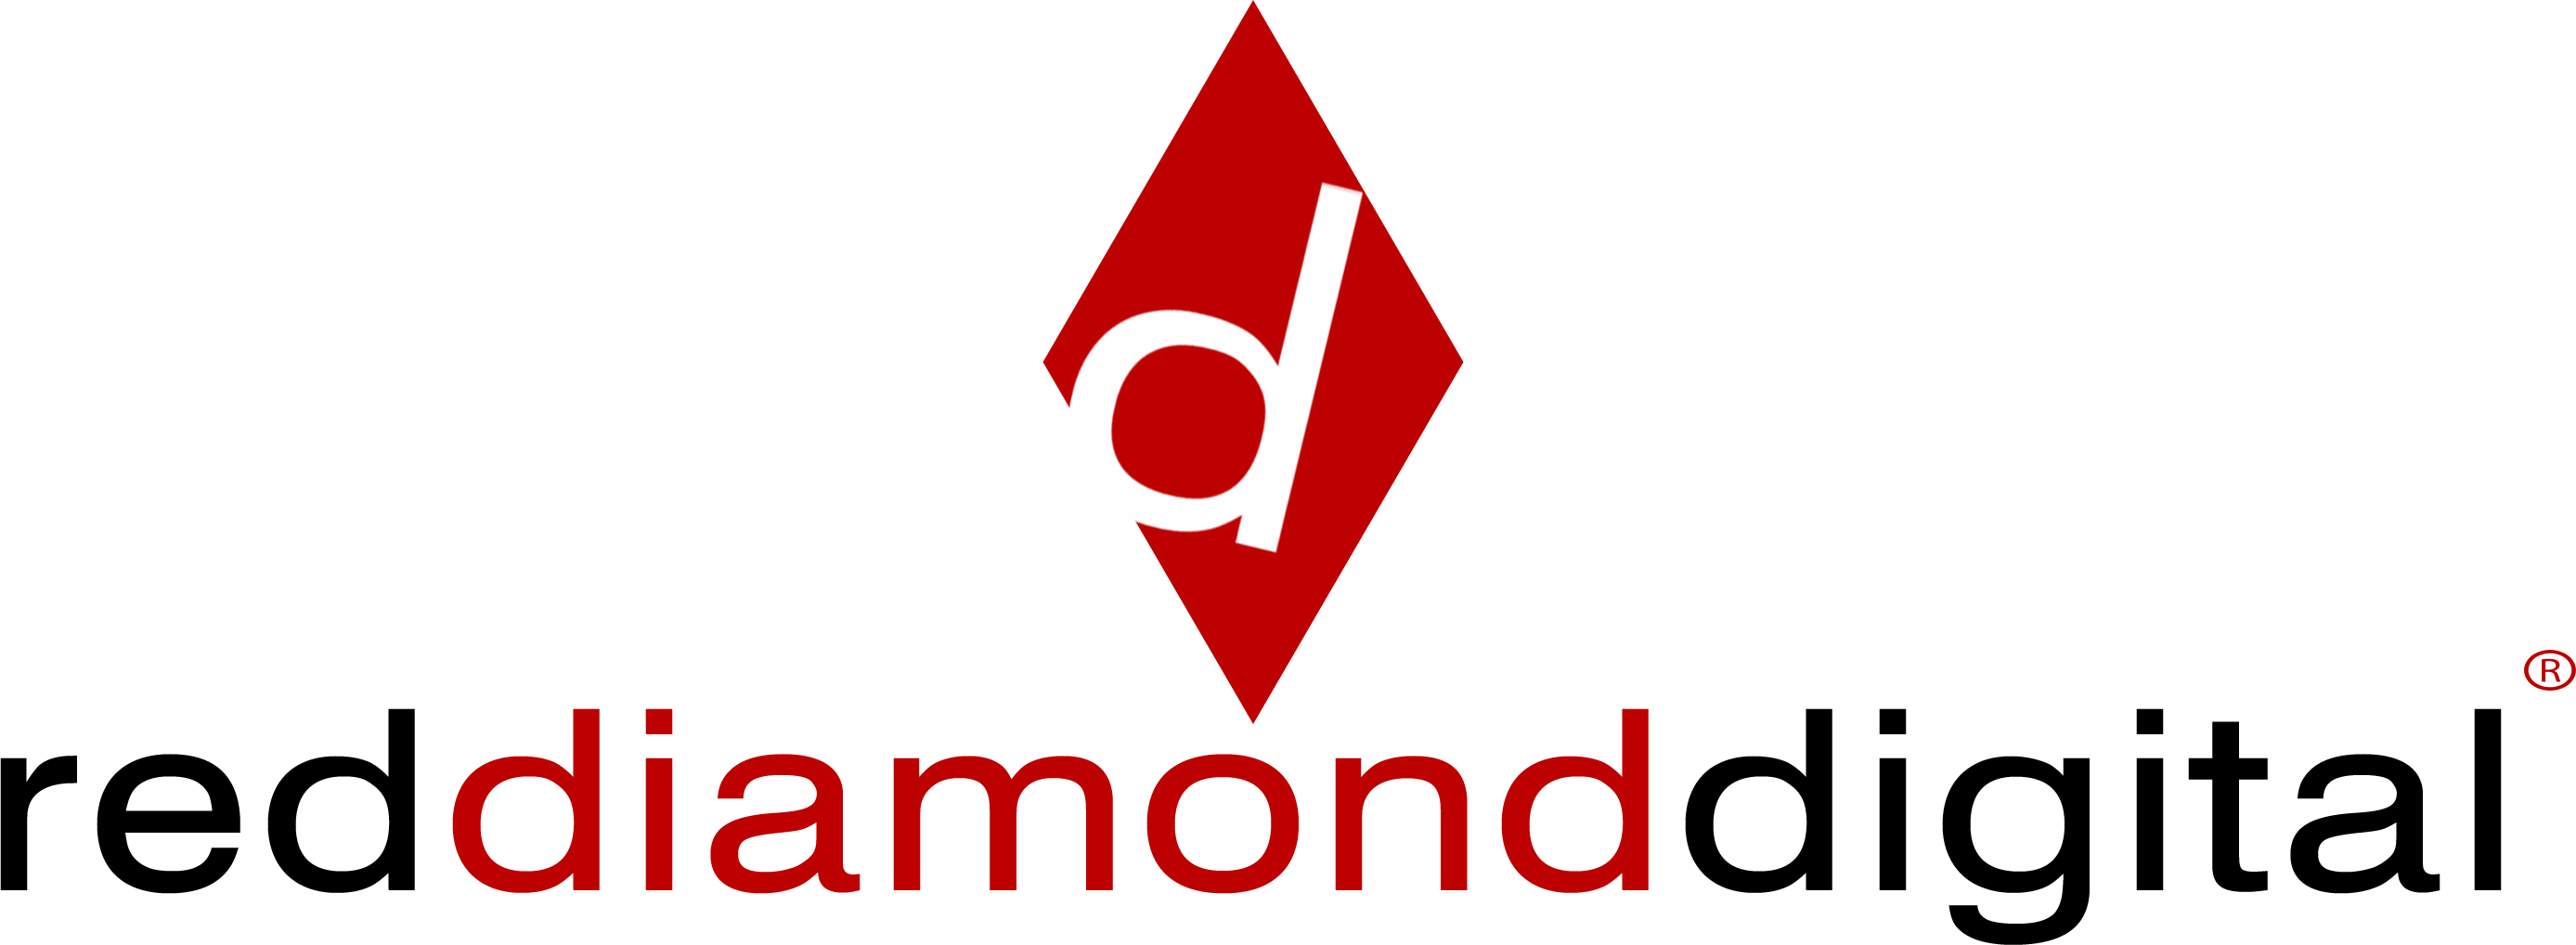 Red Diamond Digital Portfolio